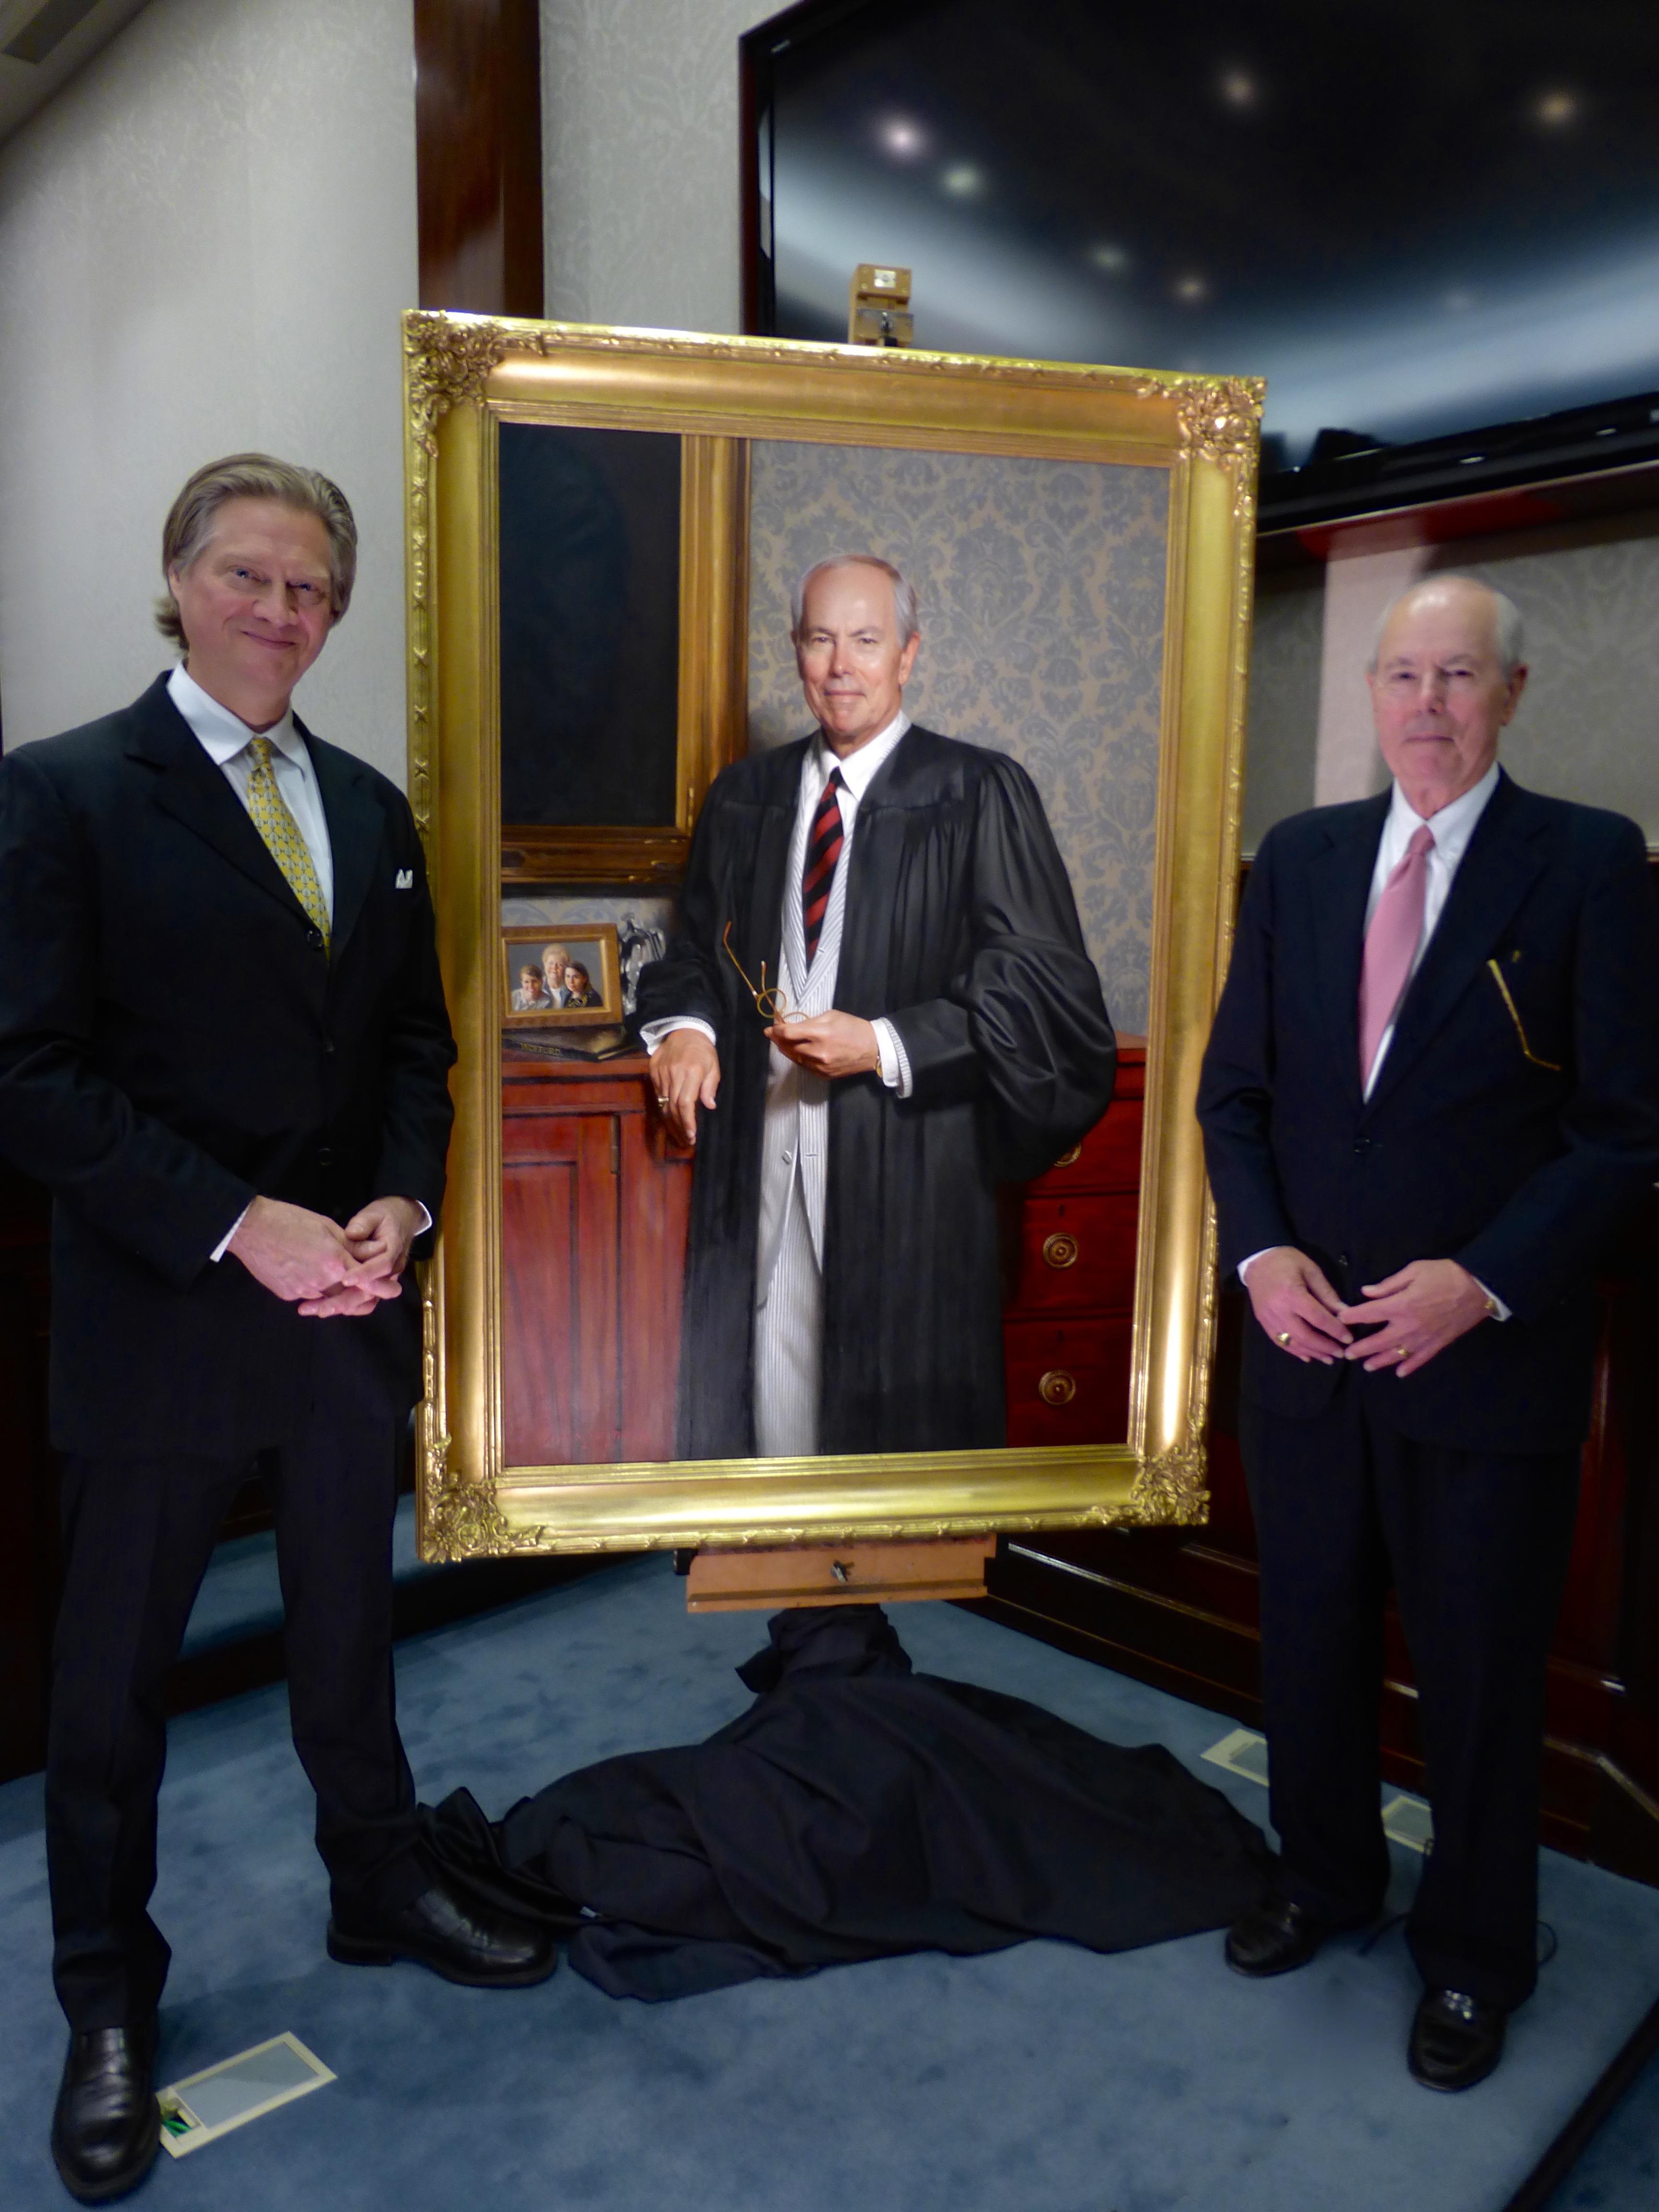 The Hon  Costa Pleicones, Chief Justice of the Supreme Court